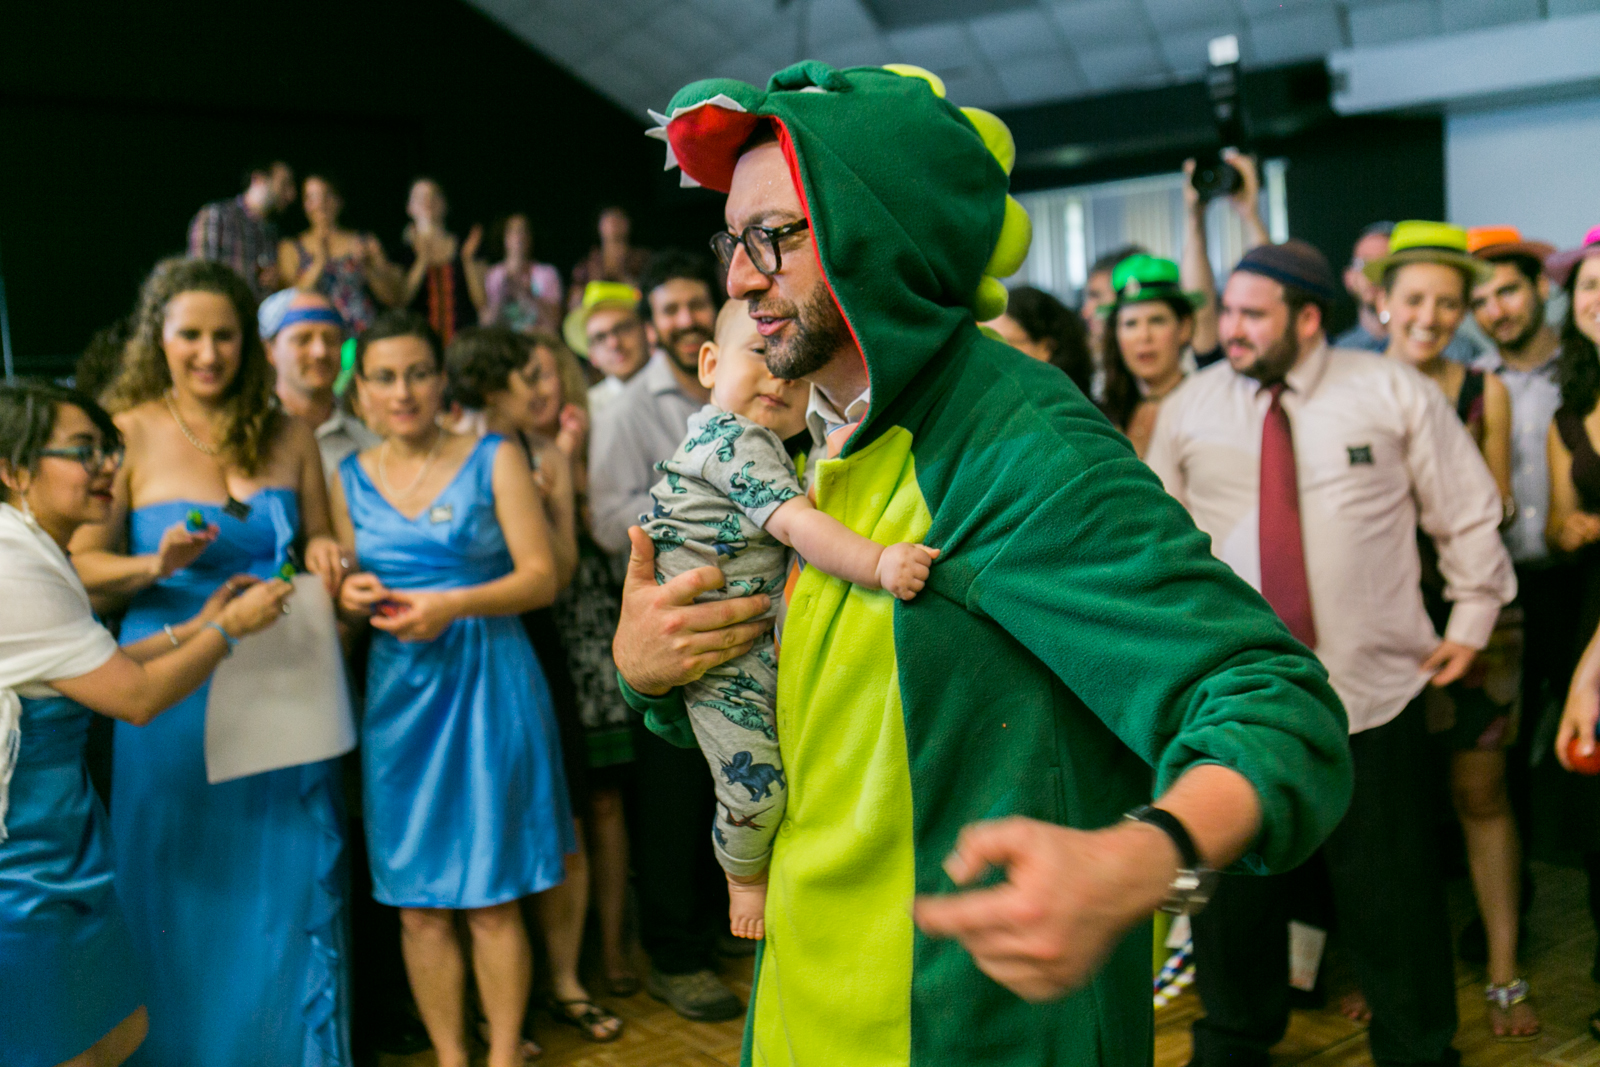 dinosaur costume and baby